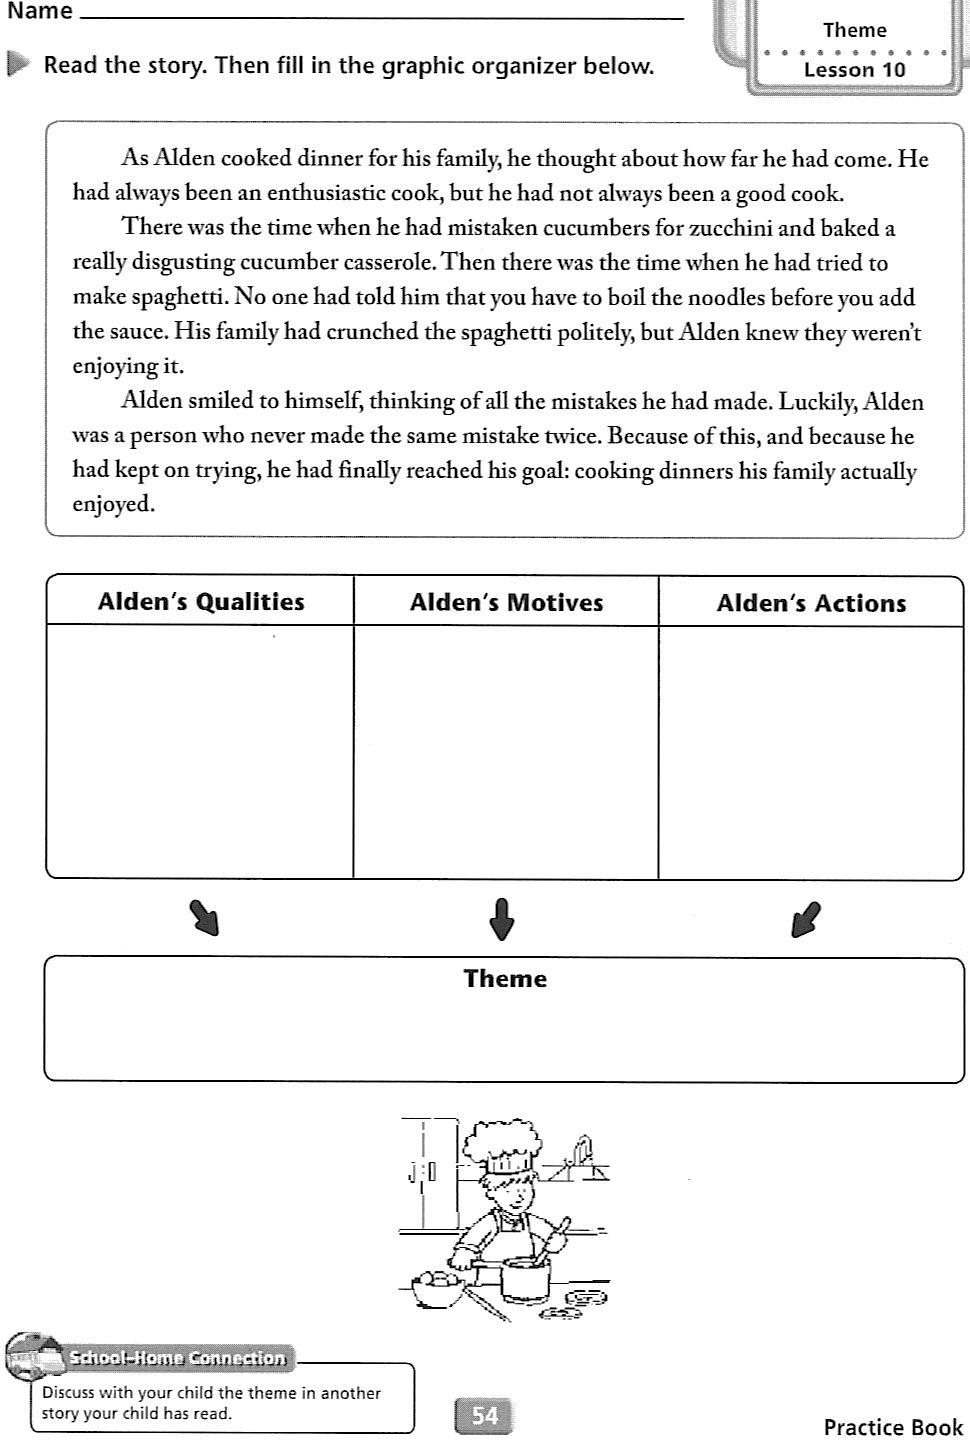 Homework helpster grade 5